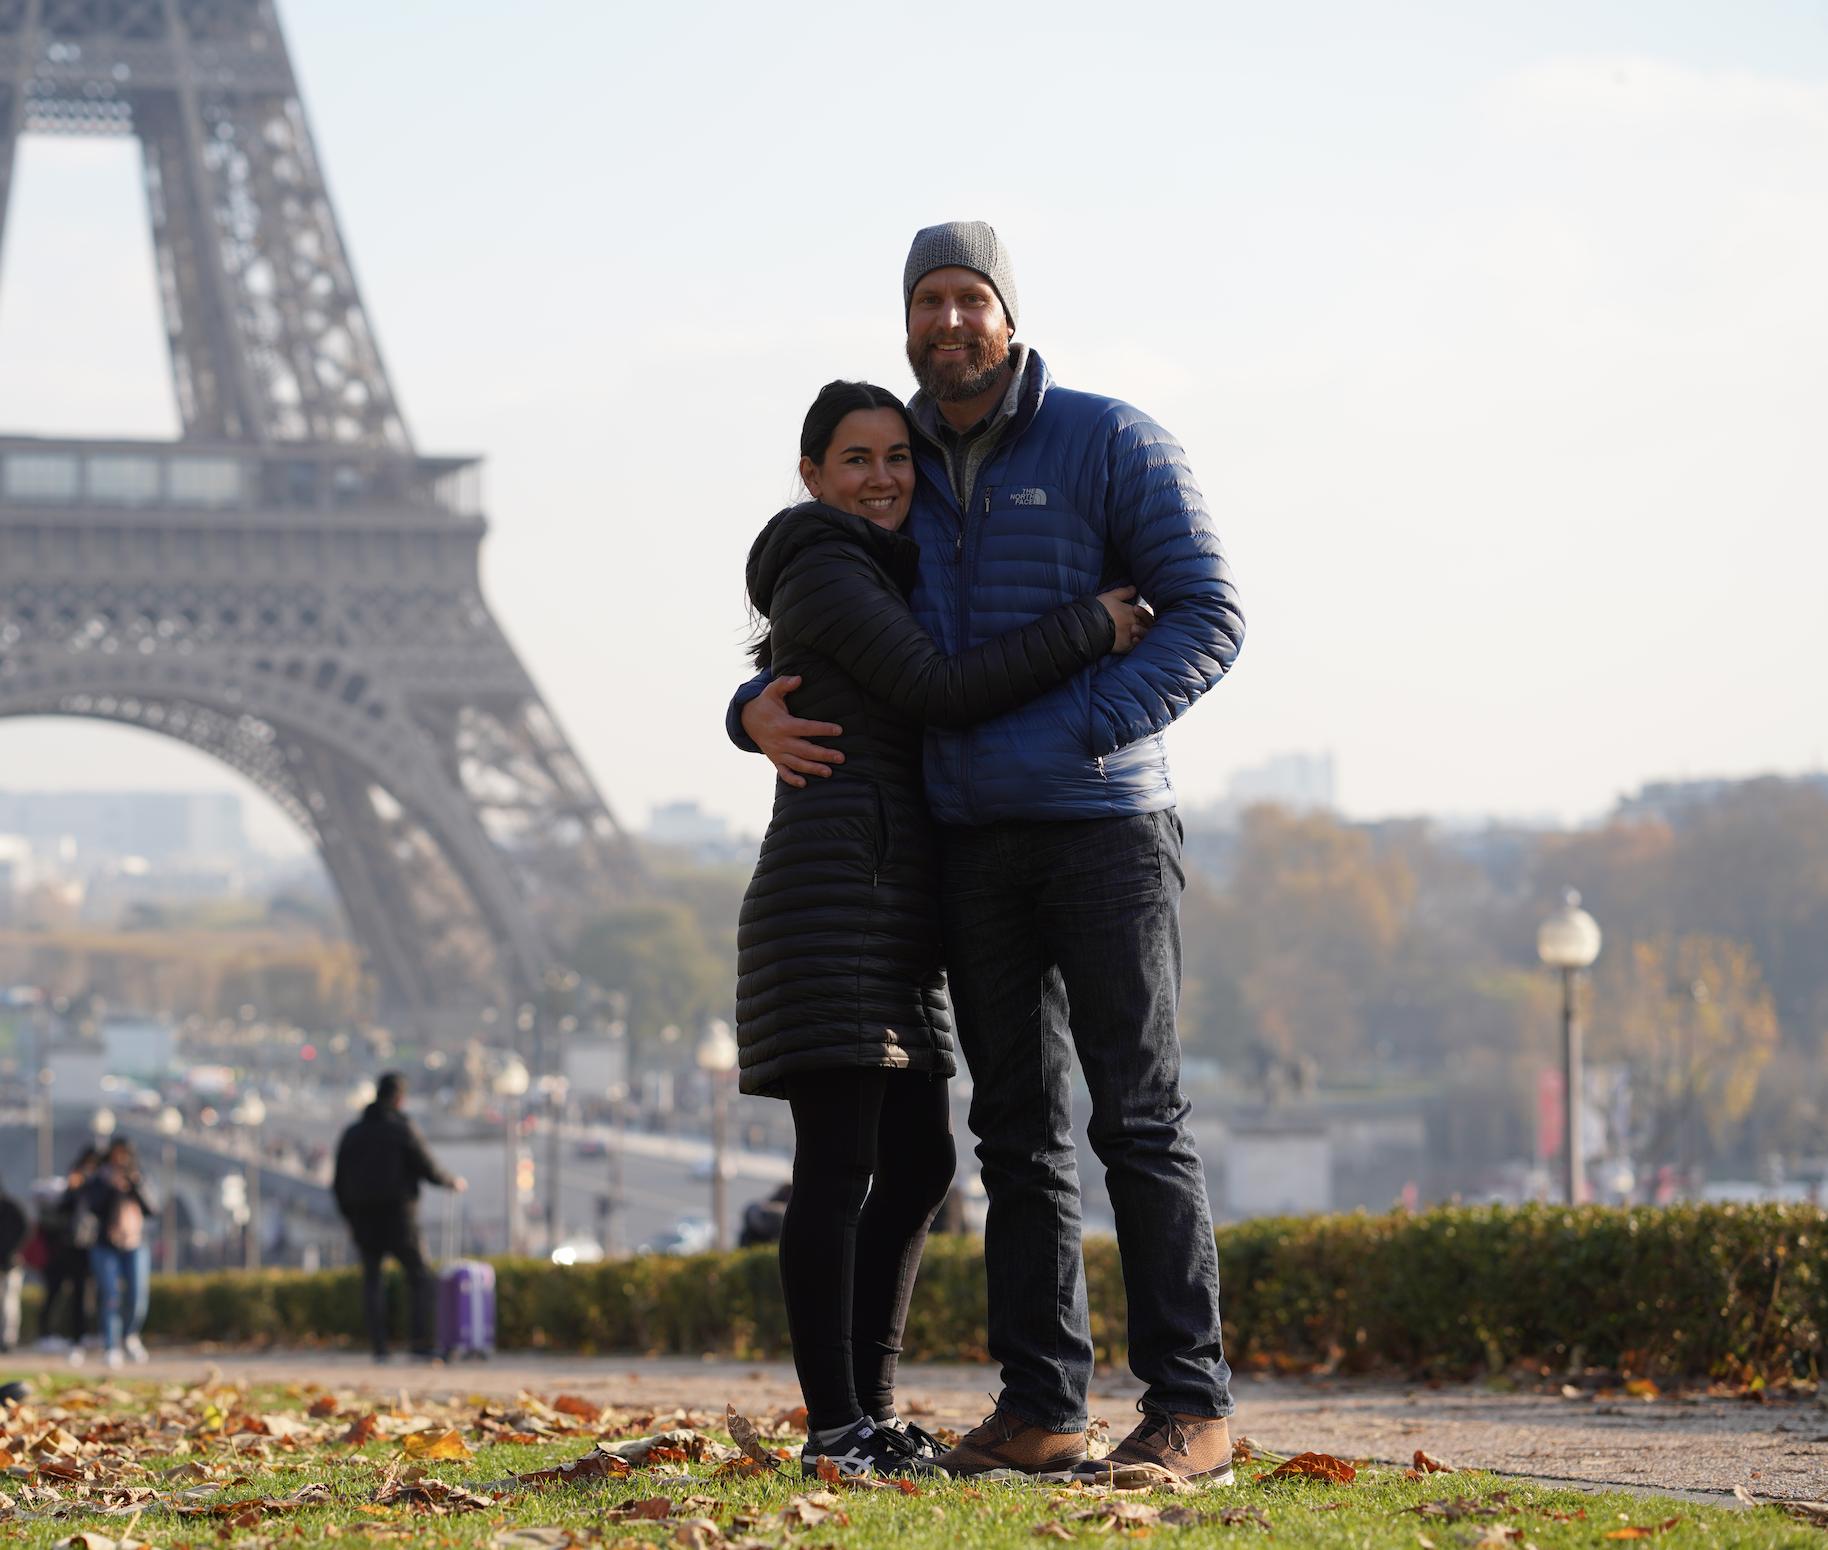 Maria-Maxit-Chris-Ellermann-Paris-Eiffle-Tower.png